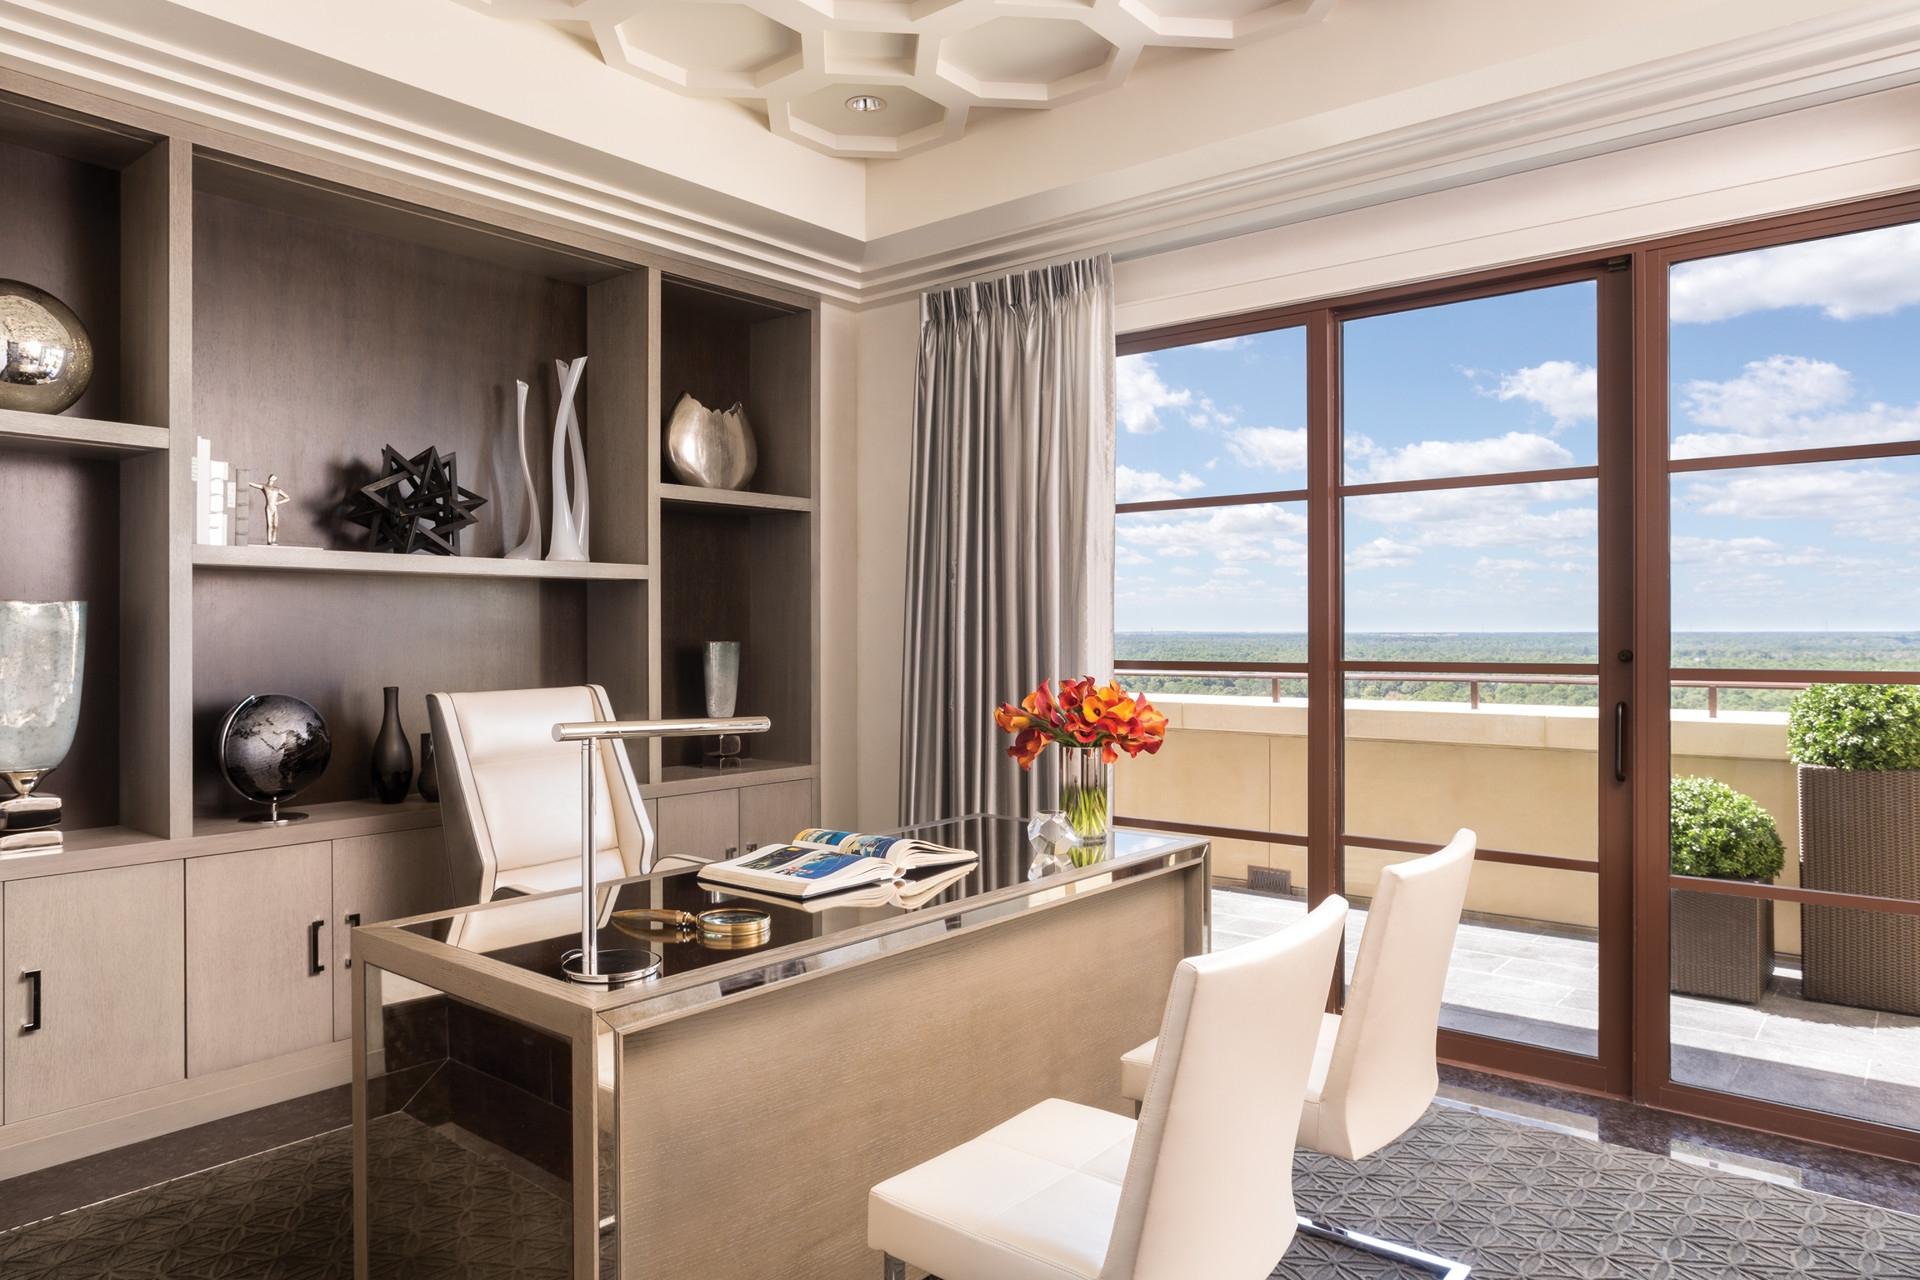 Four Seasons Orlando Suite